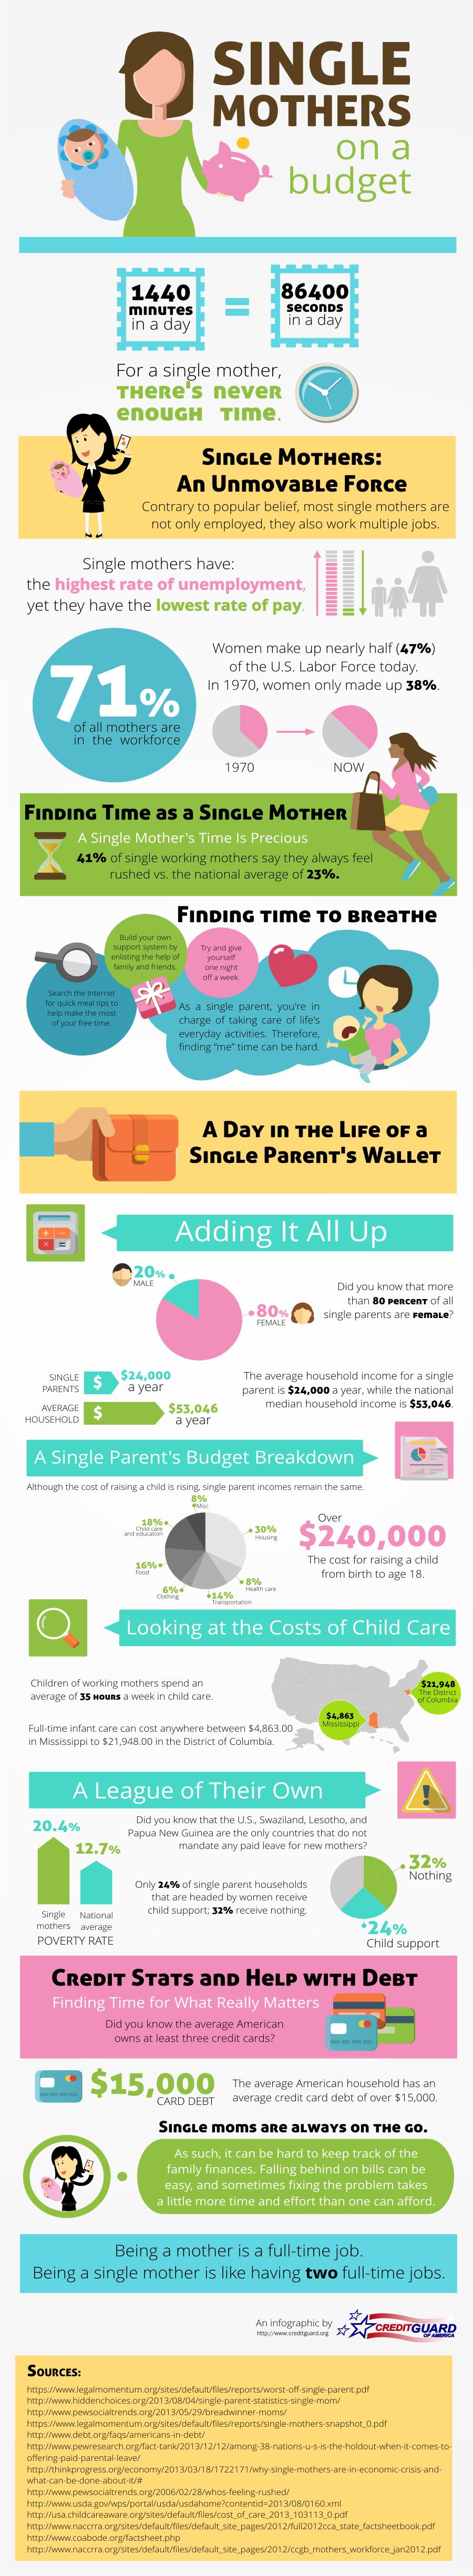 single mother spending statistics